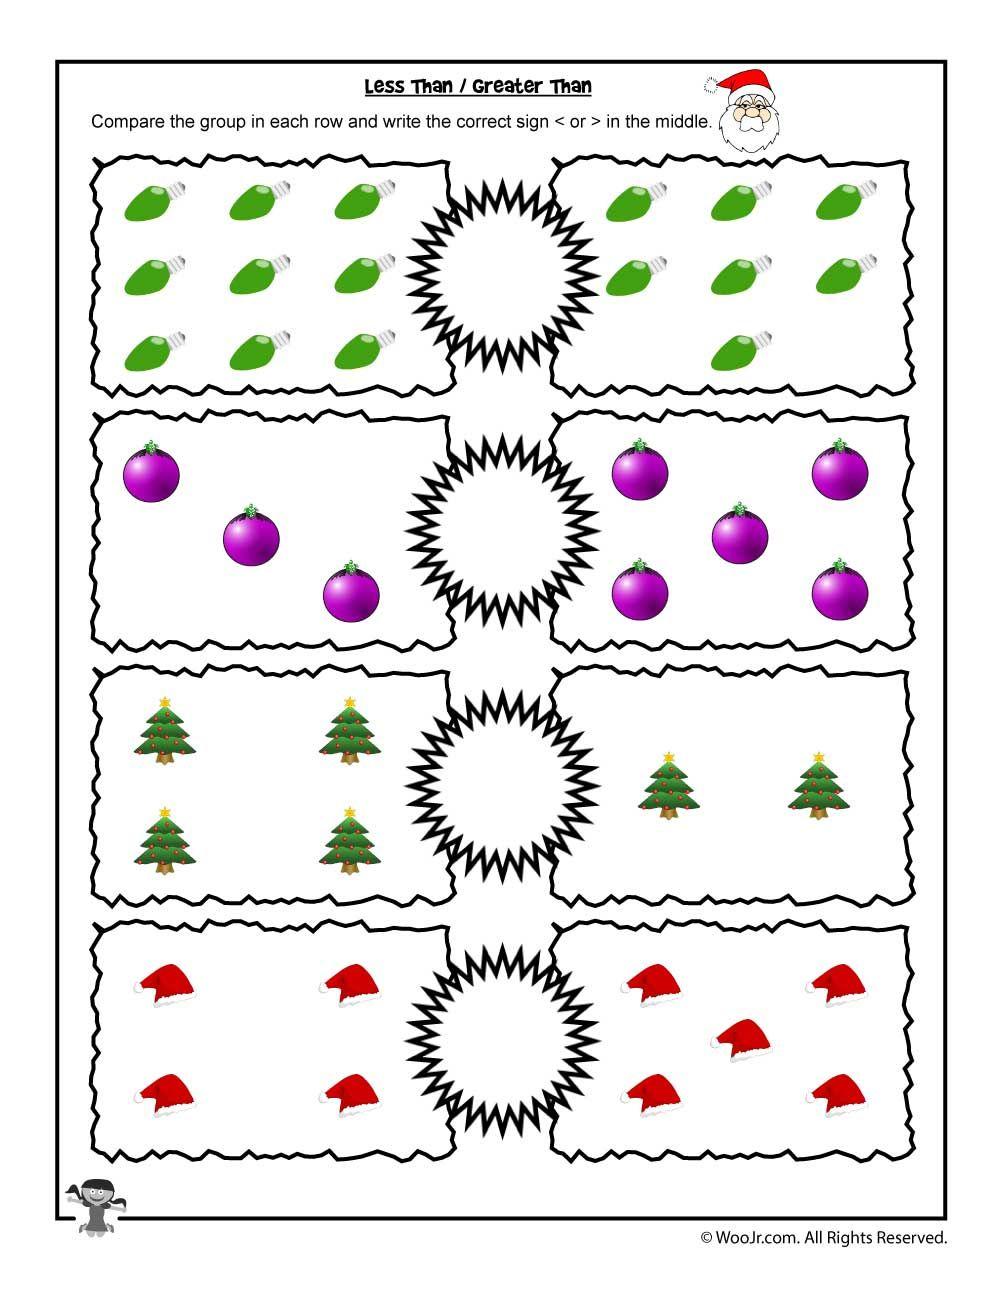 Easy 1 10 Greater Than Less Than Worksheet Woo Jr Kids Activities Thanksgiving Math Worksheets Kindergarten Math Worksheets Addition Christmas Math Worksheets [ 1294 x 1000 Pixel ]